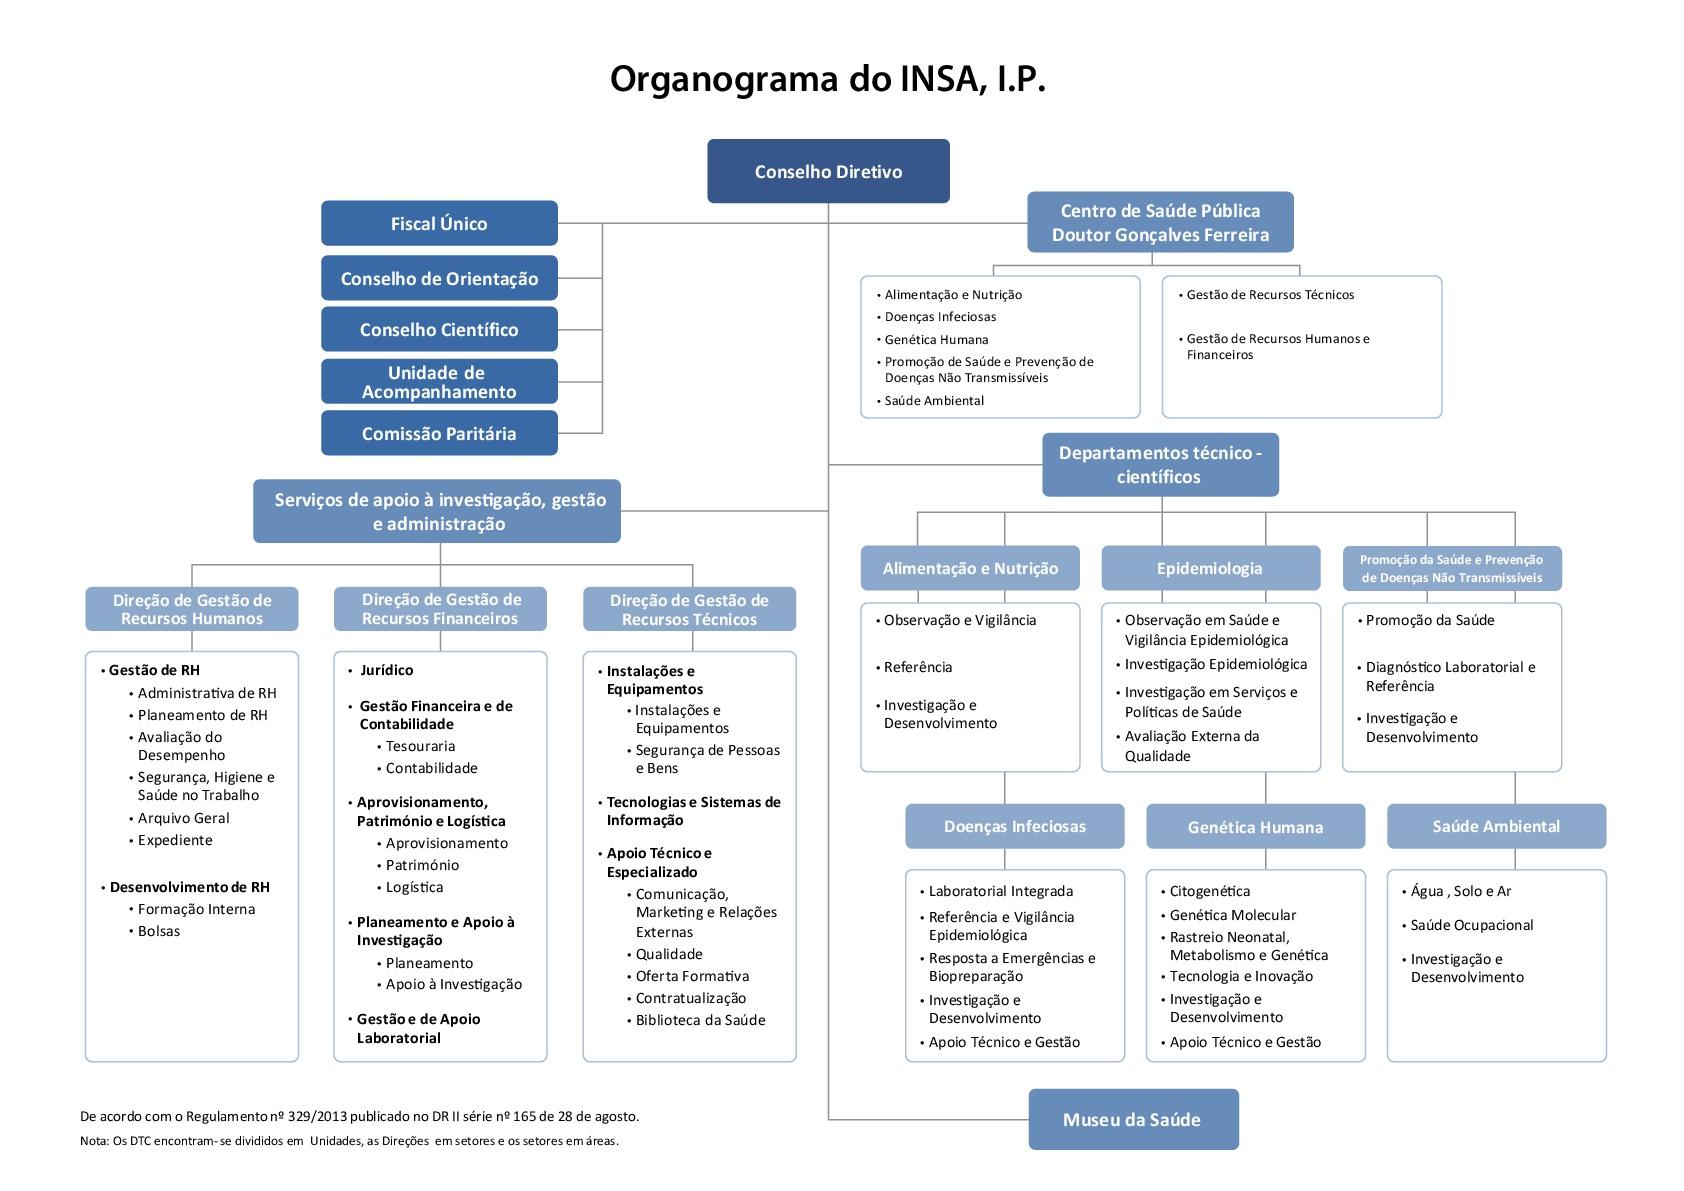 SNS_organograma_INSA